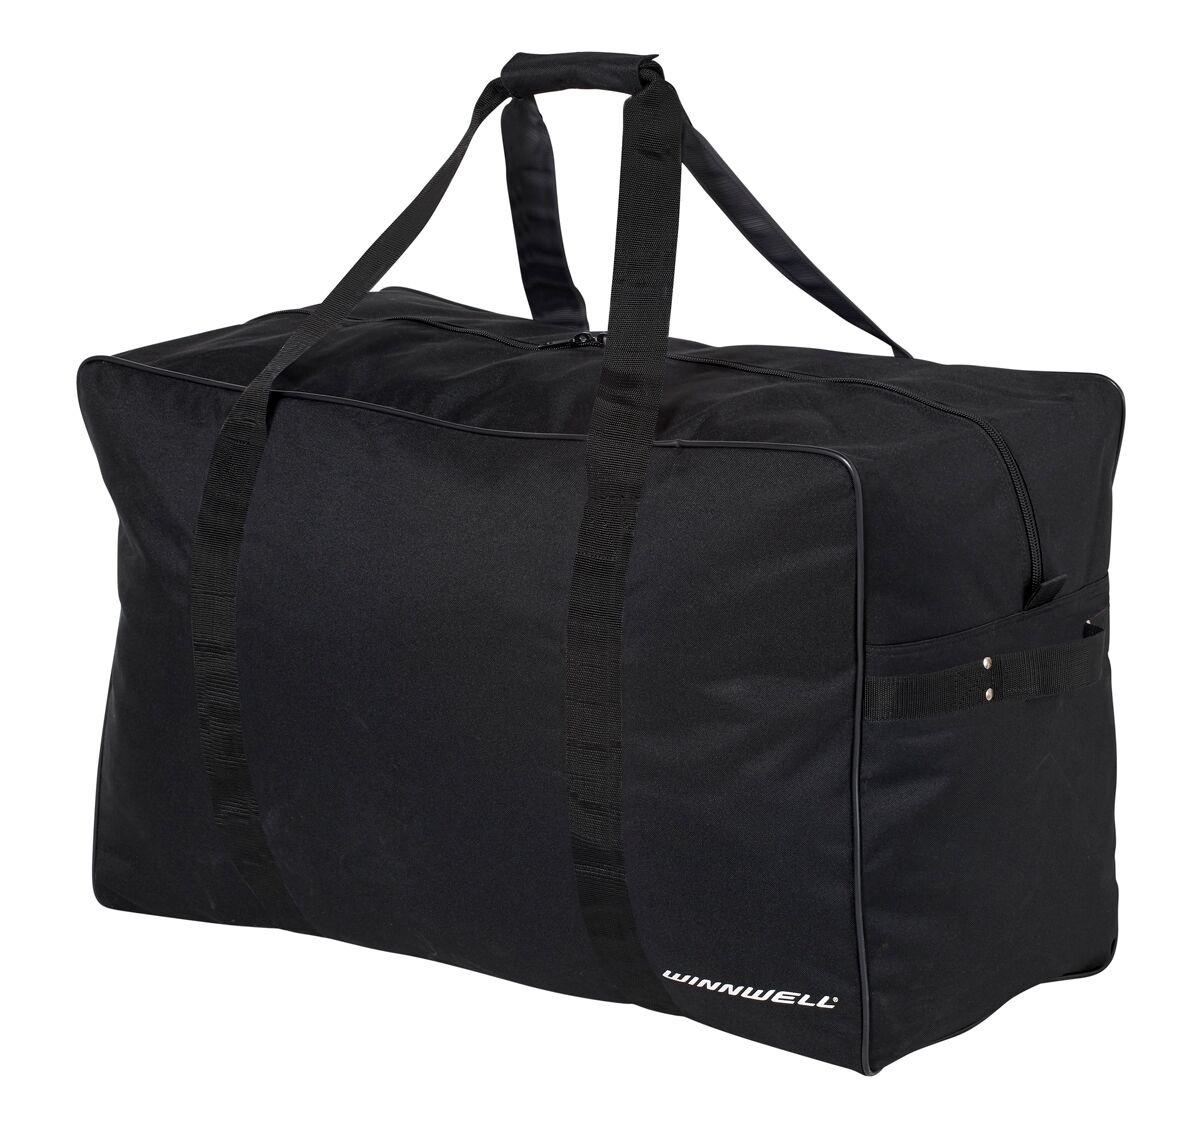 Taška Winnwell Basic Carry SR